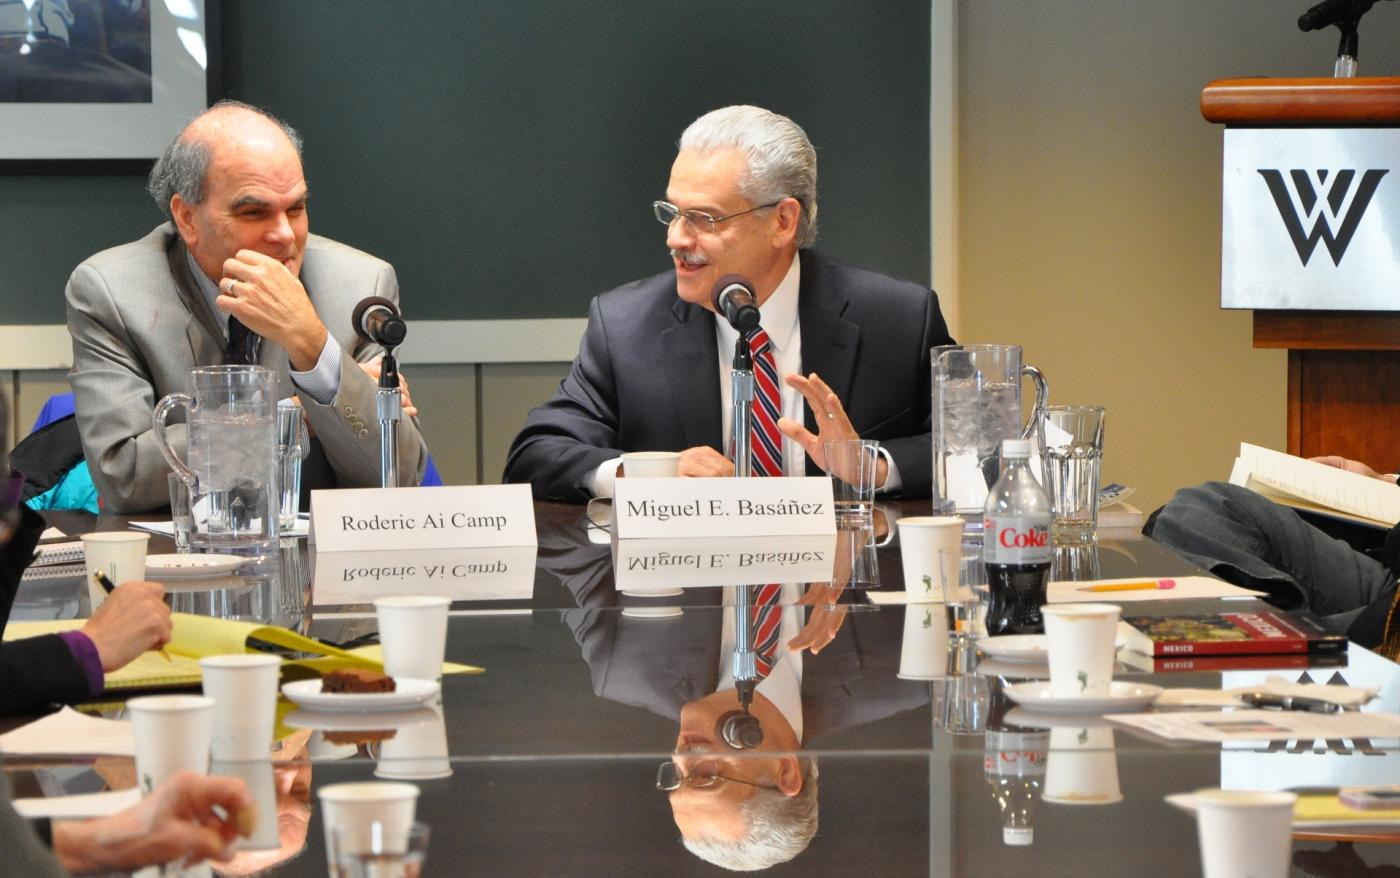 Roderic Ai Camp, left, and Miguel E. Basáñez talk about Camp's recent books about politics in Mexico. (Salvador Guerrero/SHFWire)